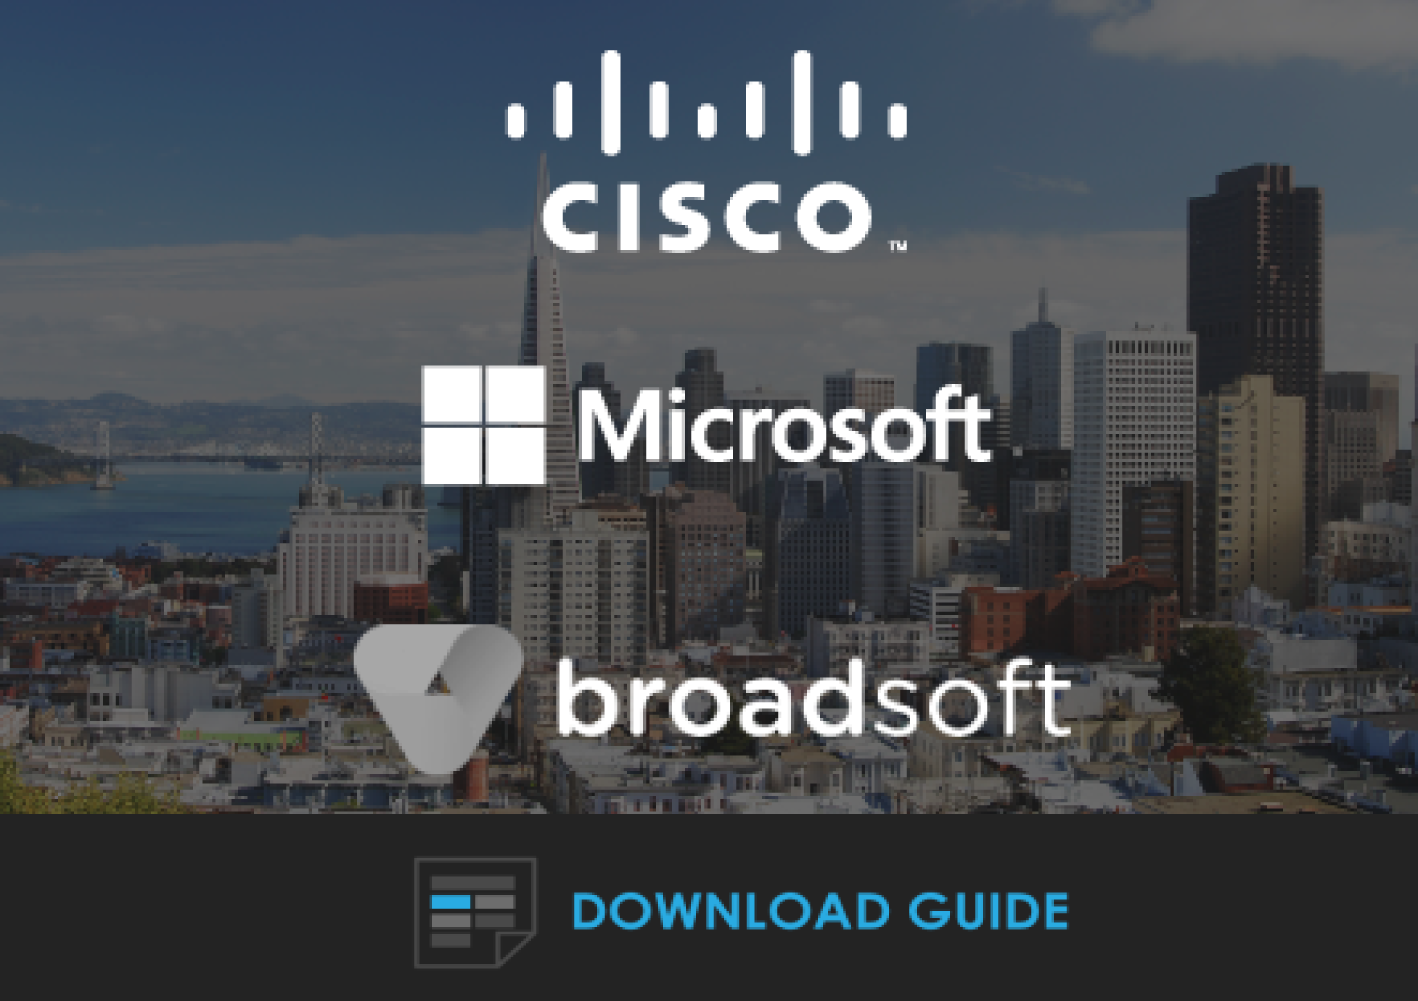 Cisco Microsoft Broadsoft Guide